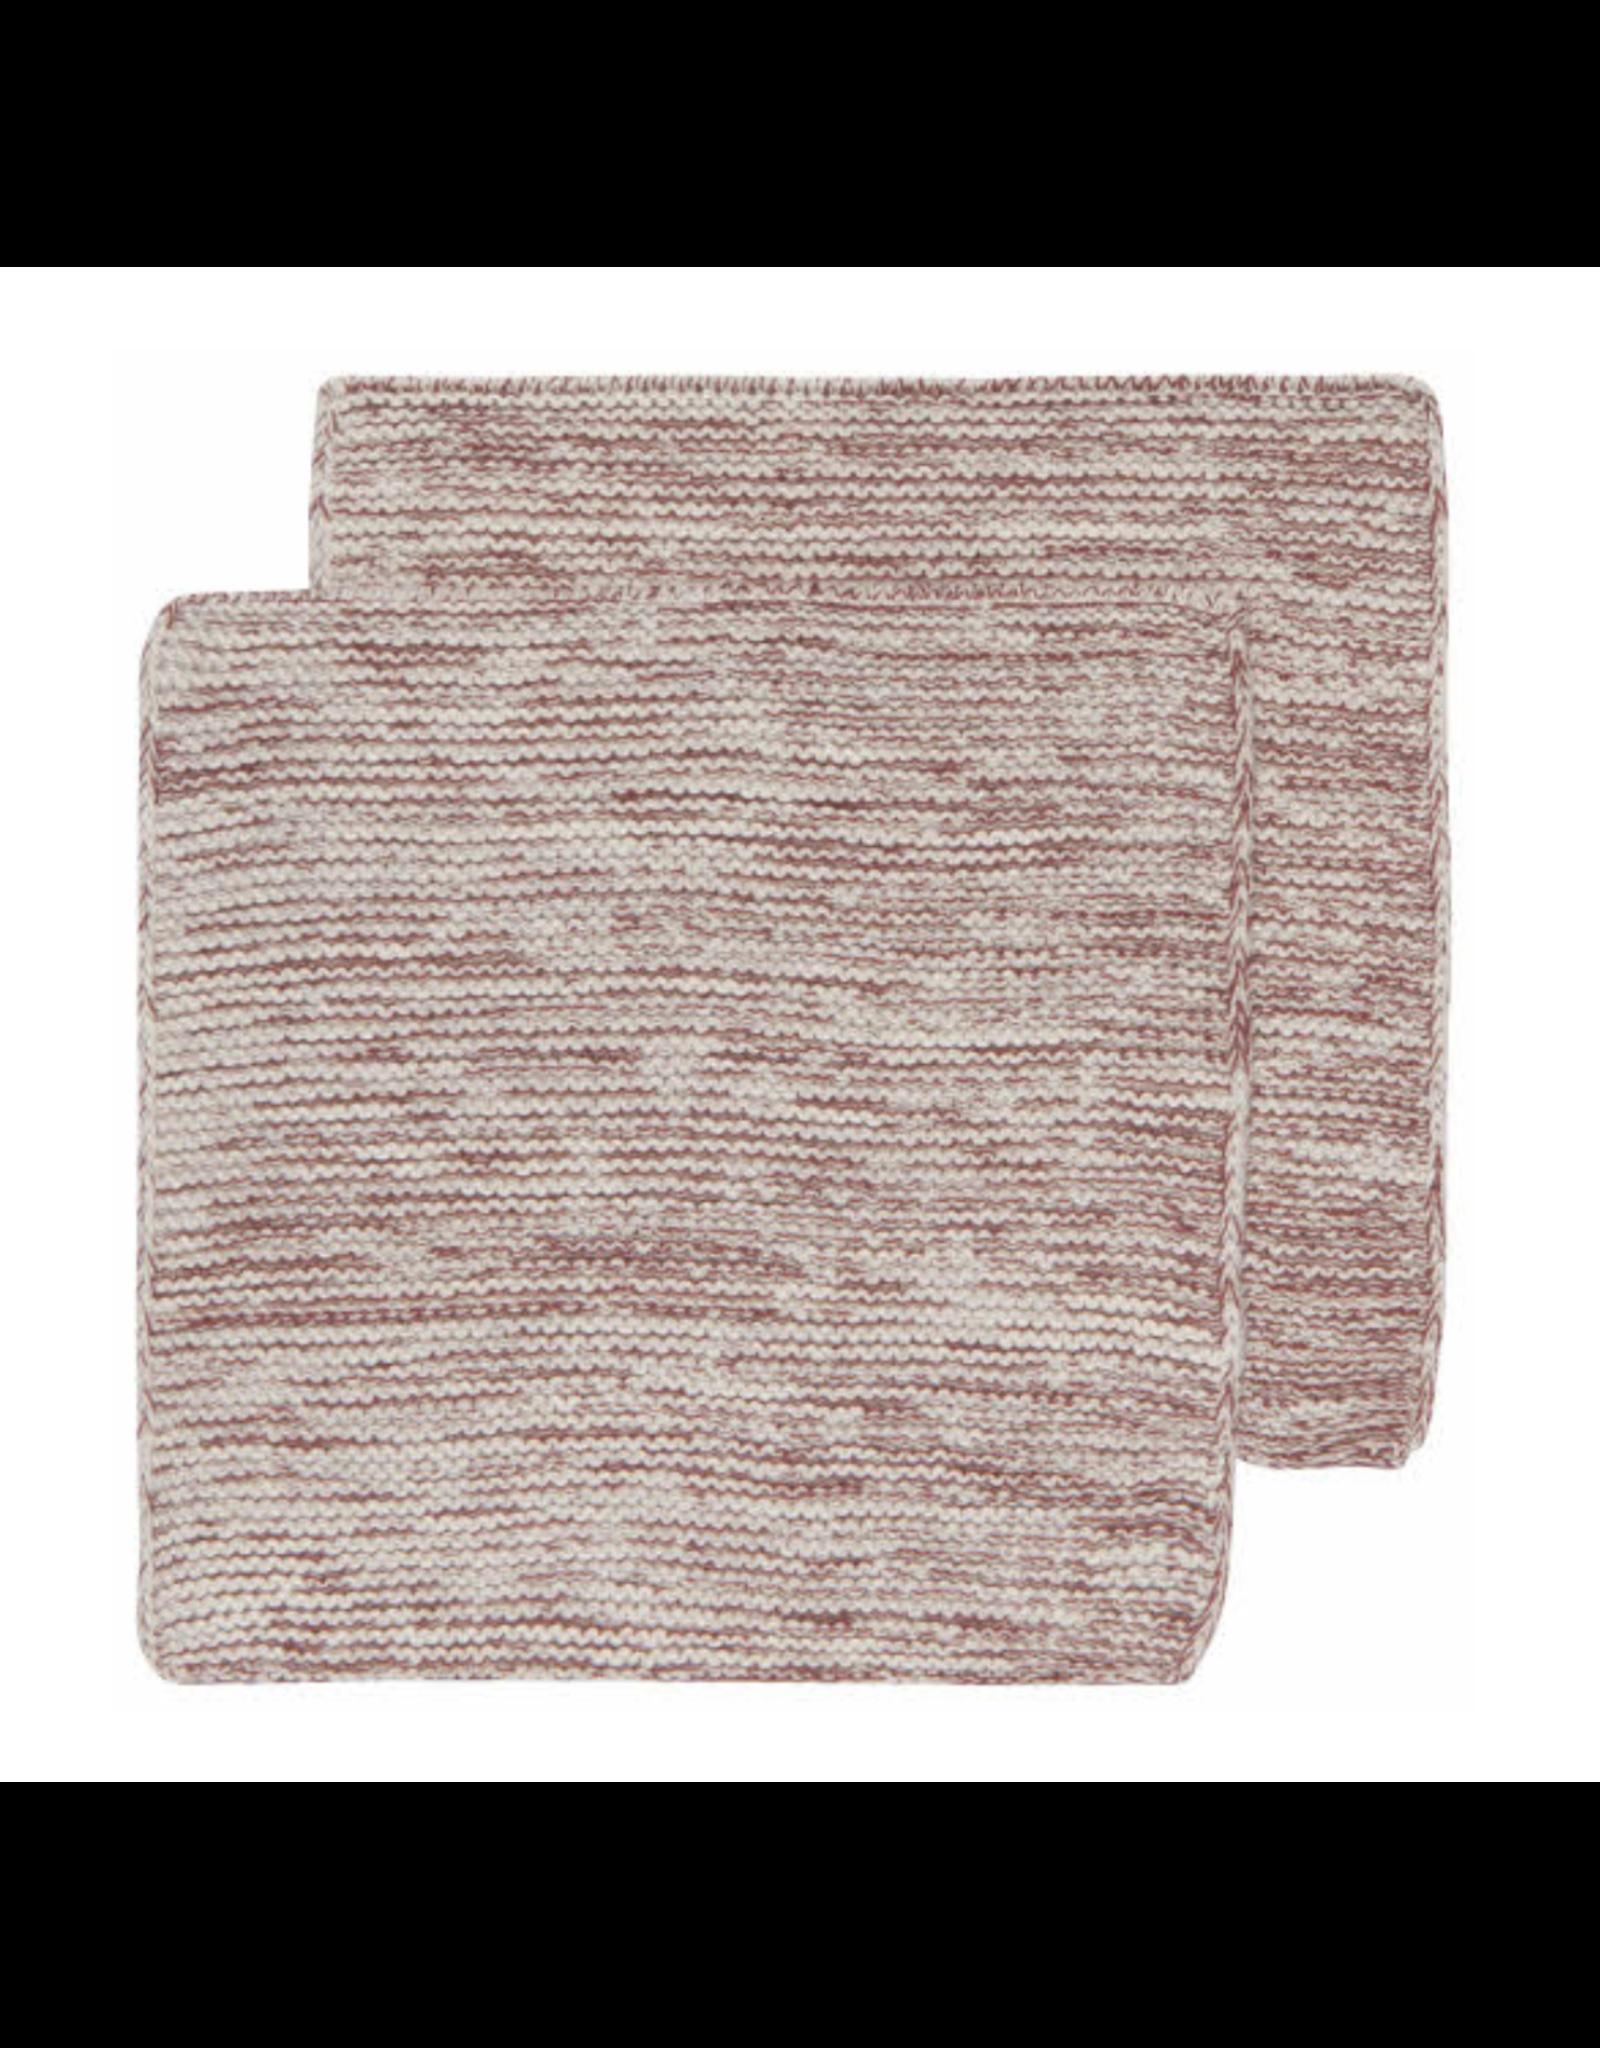 Knit Heirloom Dishcloths Set/2 - Wine